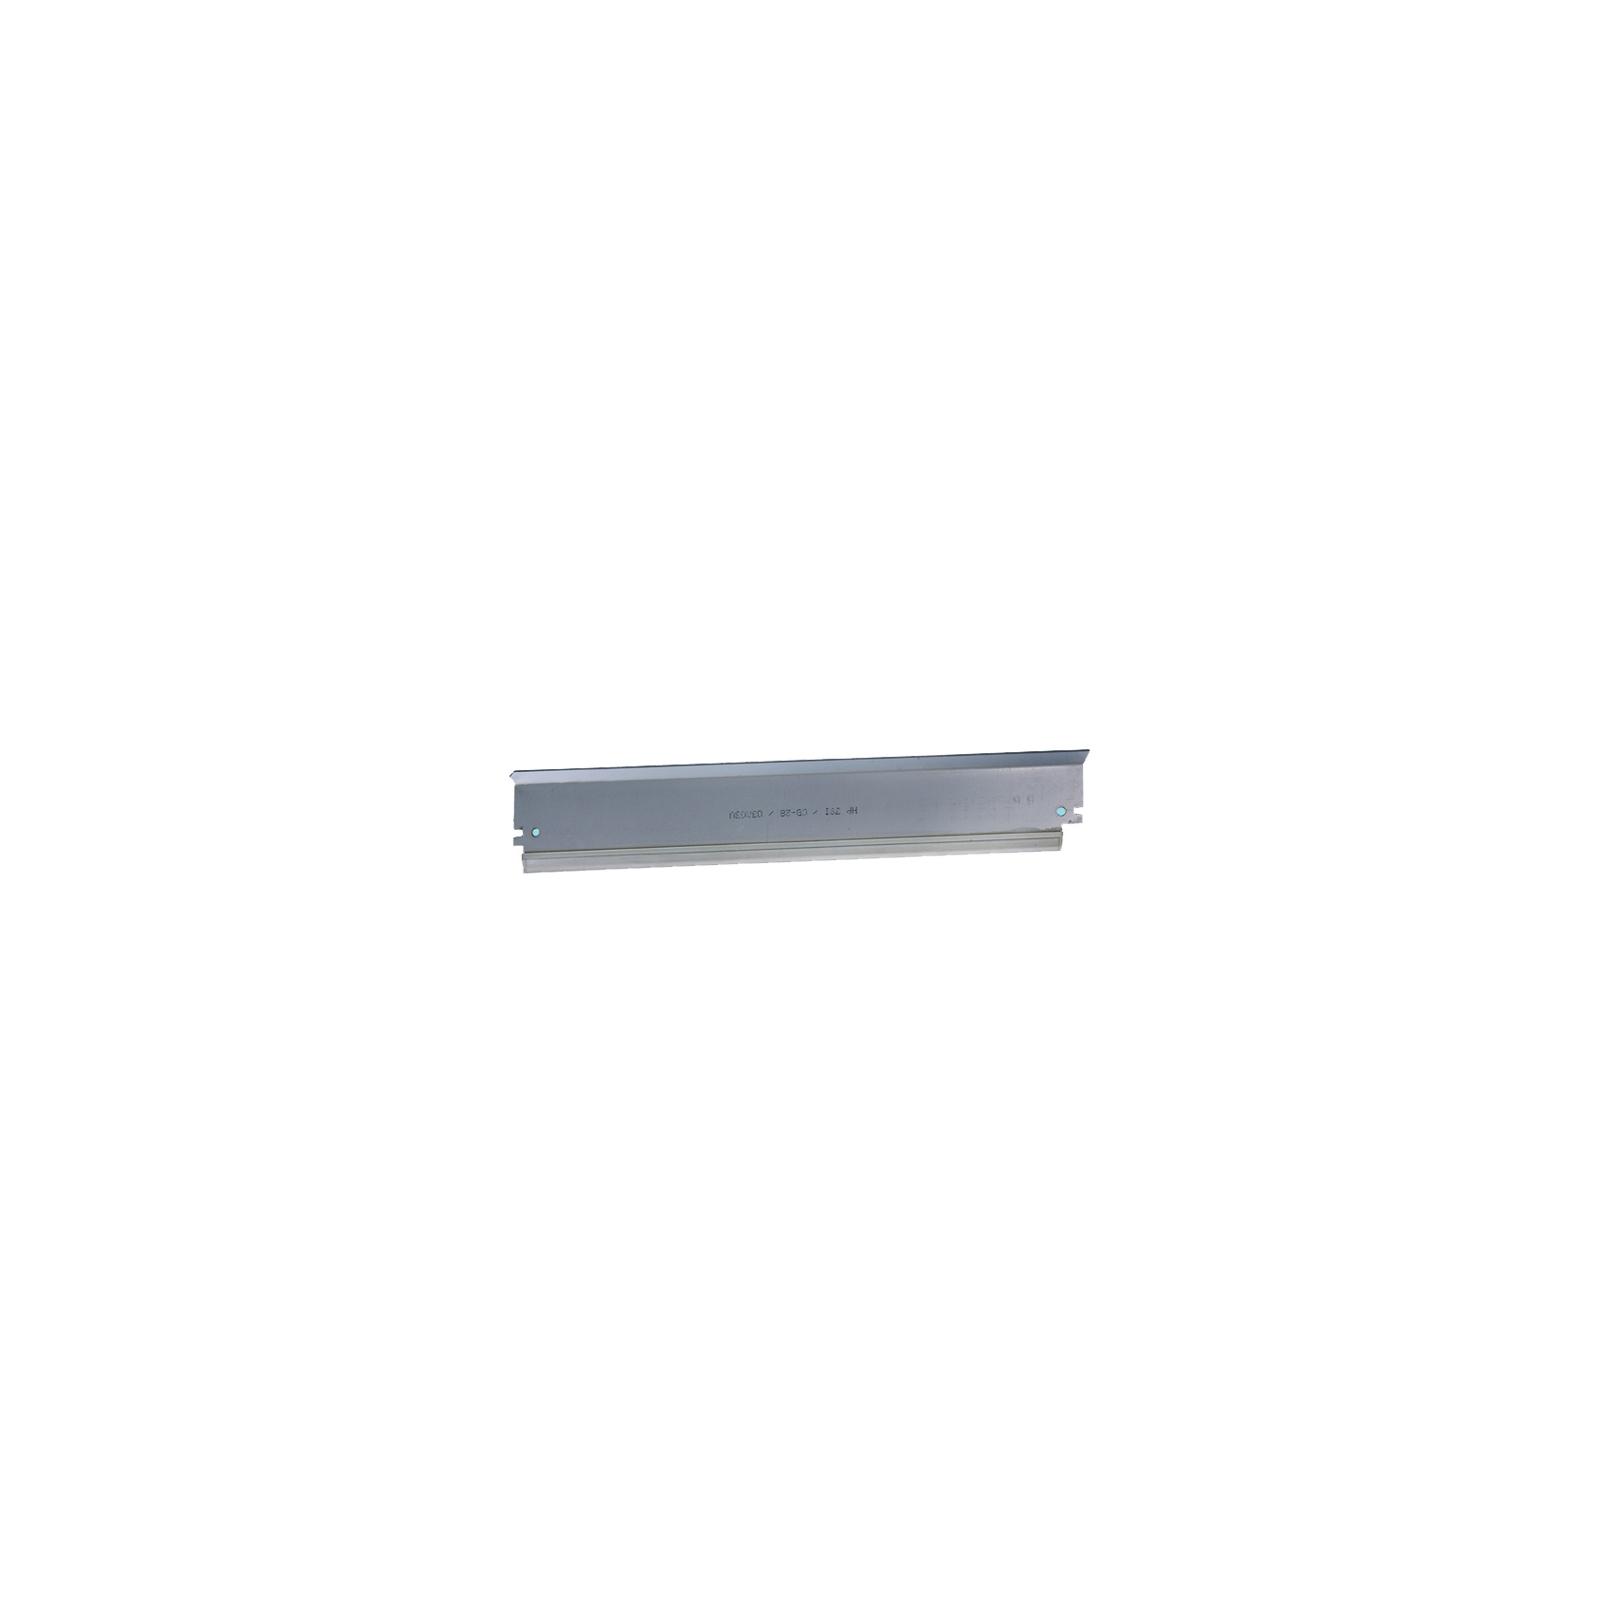 Чистящее лезвие Static Control HP LJ 5000/8100/9000 (5KBLADE)